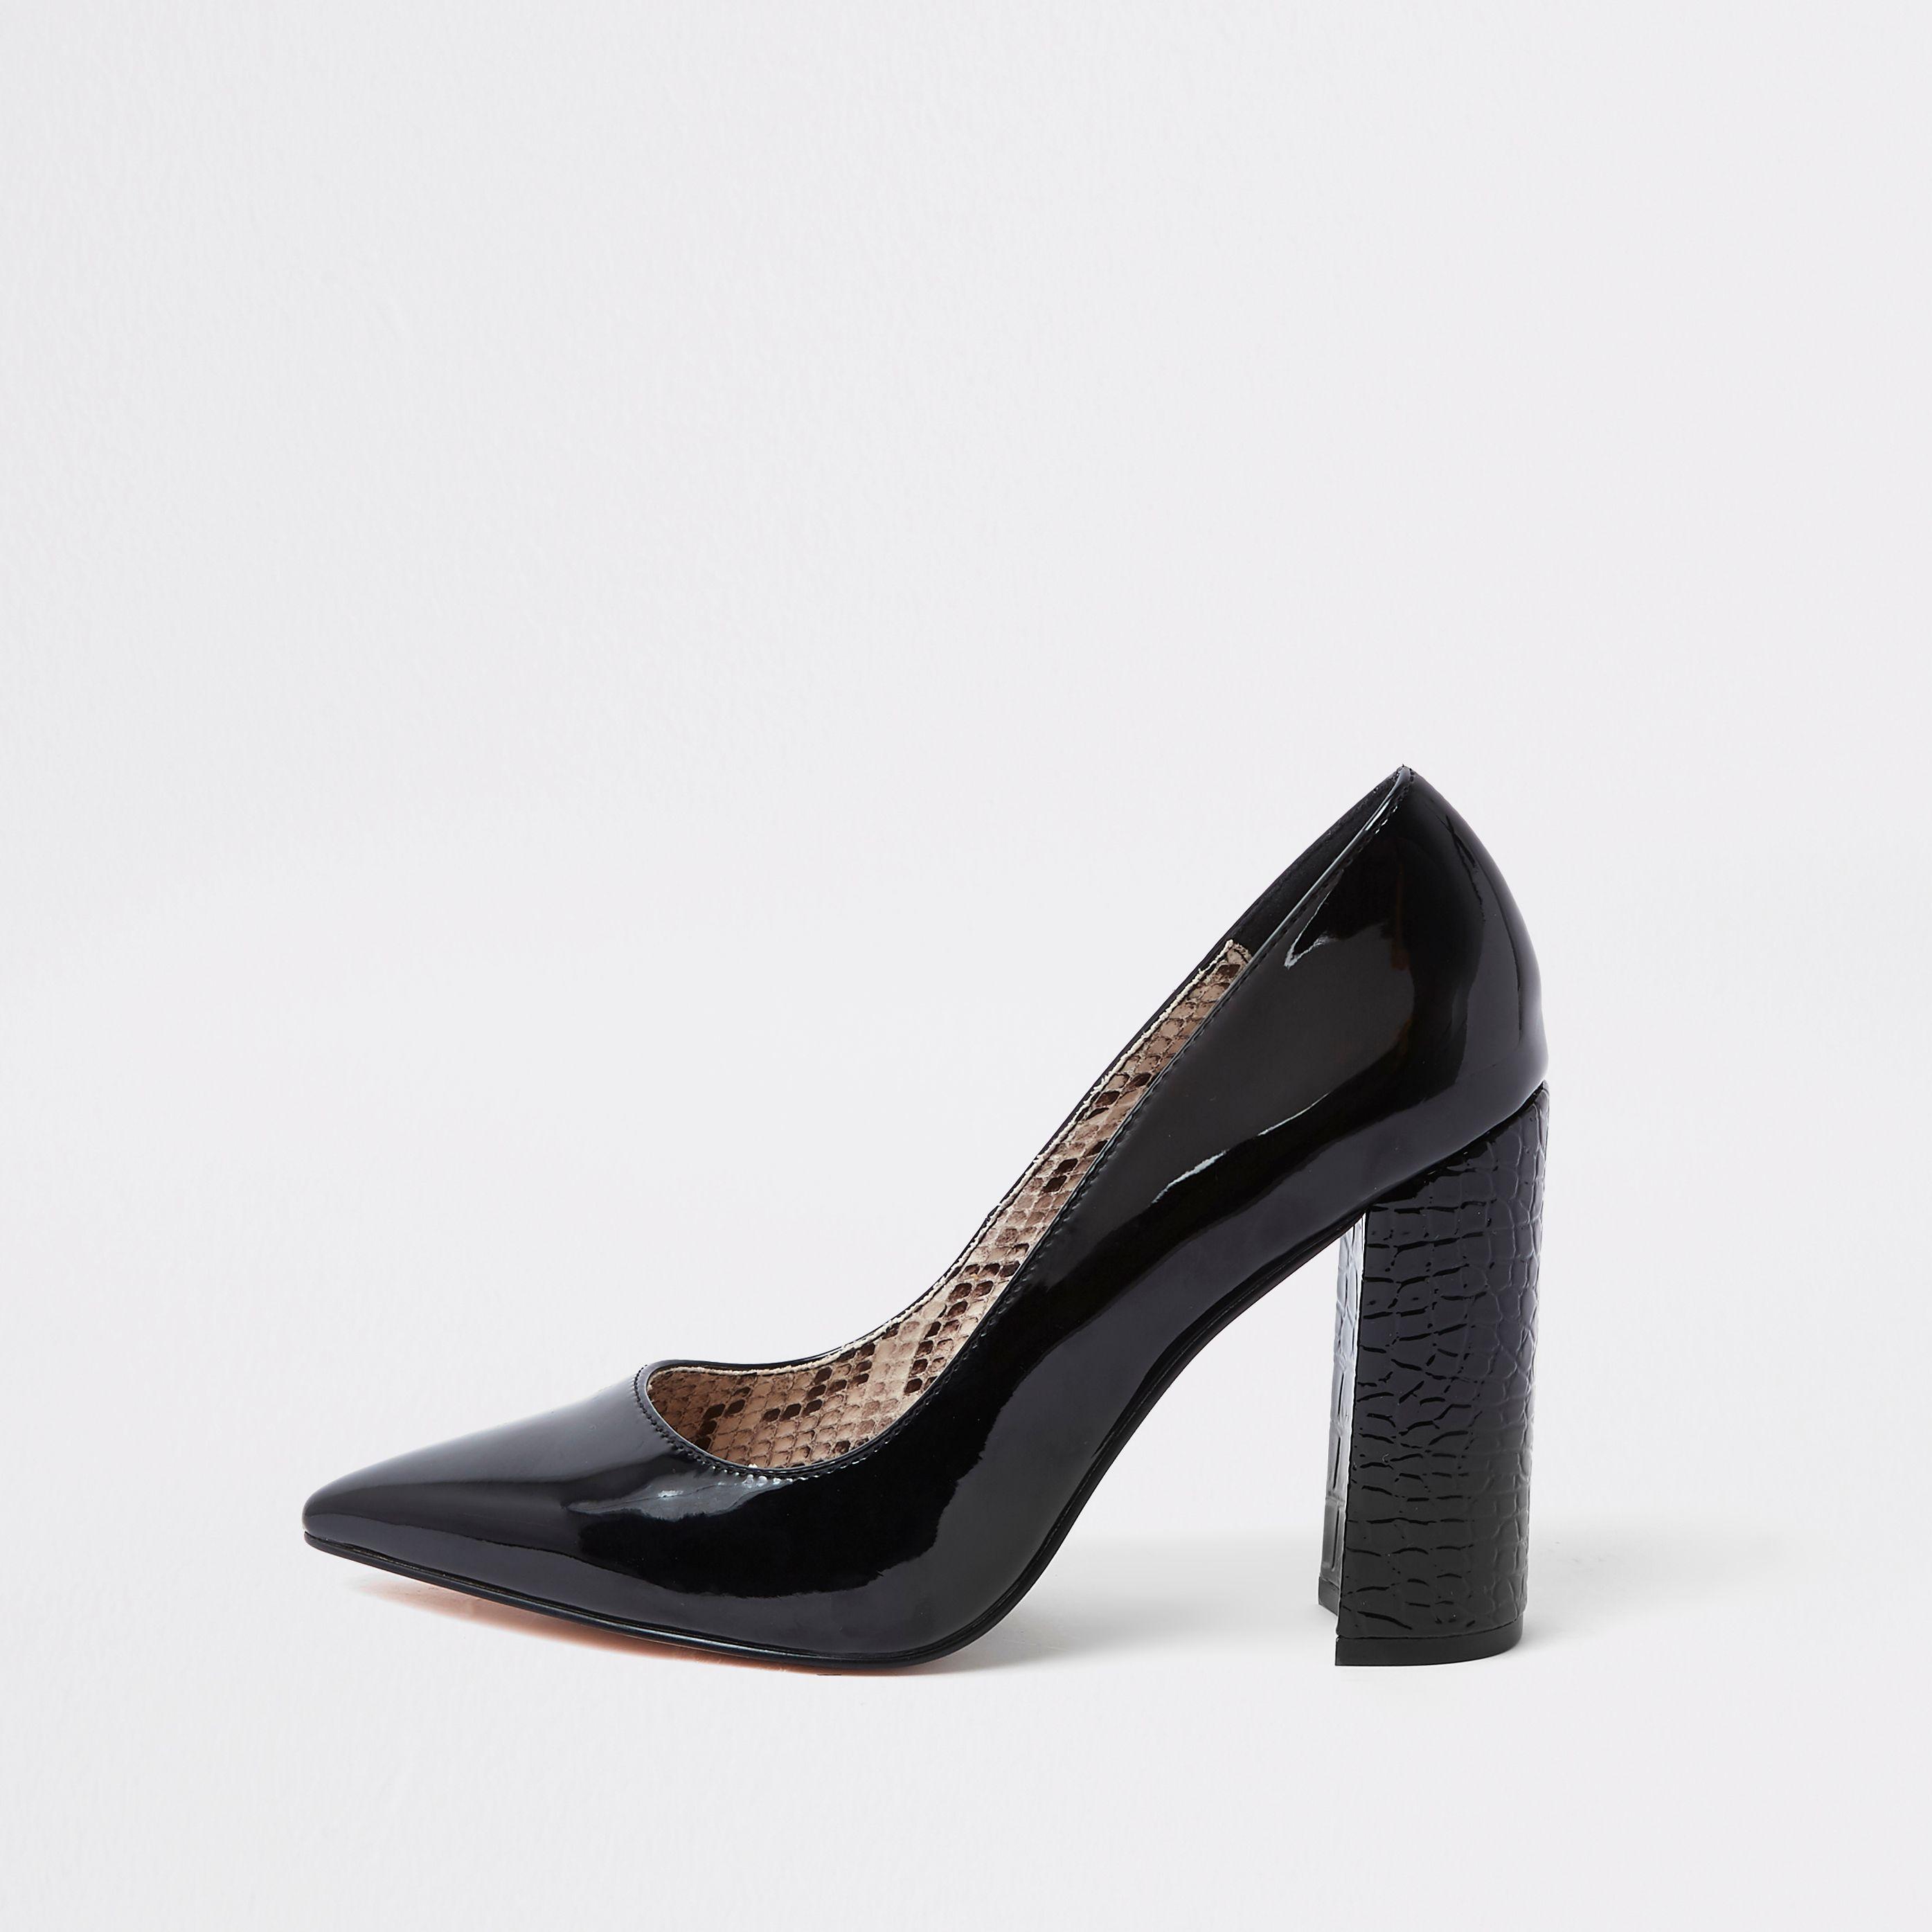 04b5bb12b49 Black wrap around block heel court shoes in 2019 | Products | Heels ...